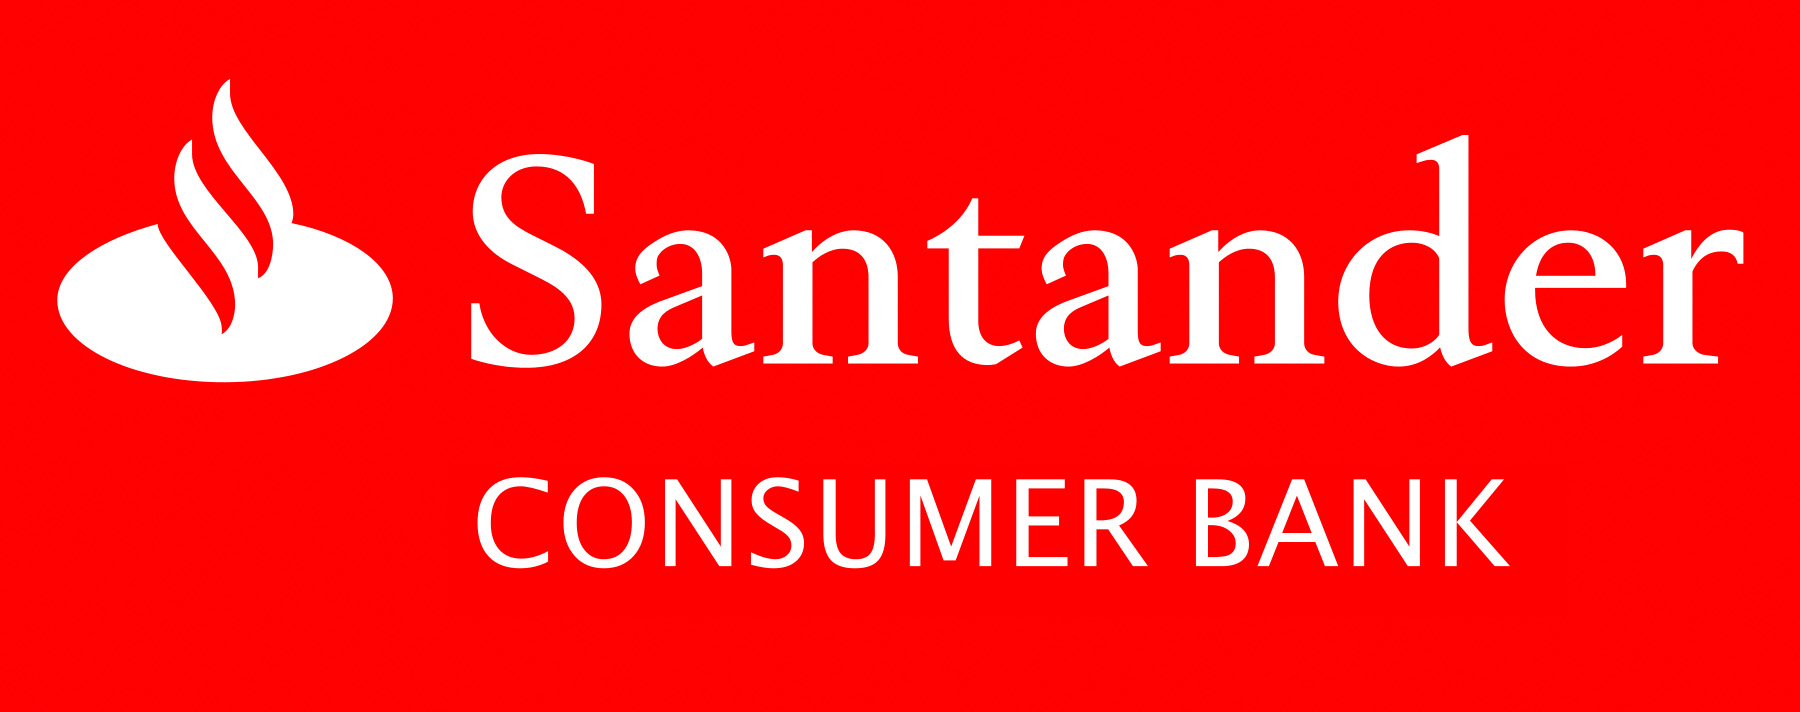 Santander logo - Be up santander ...